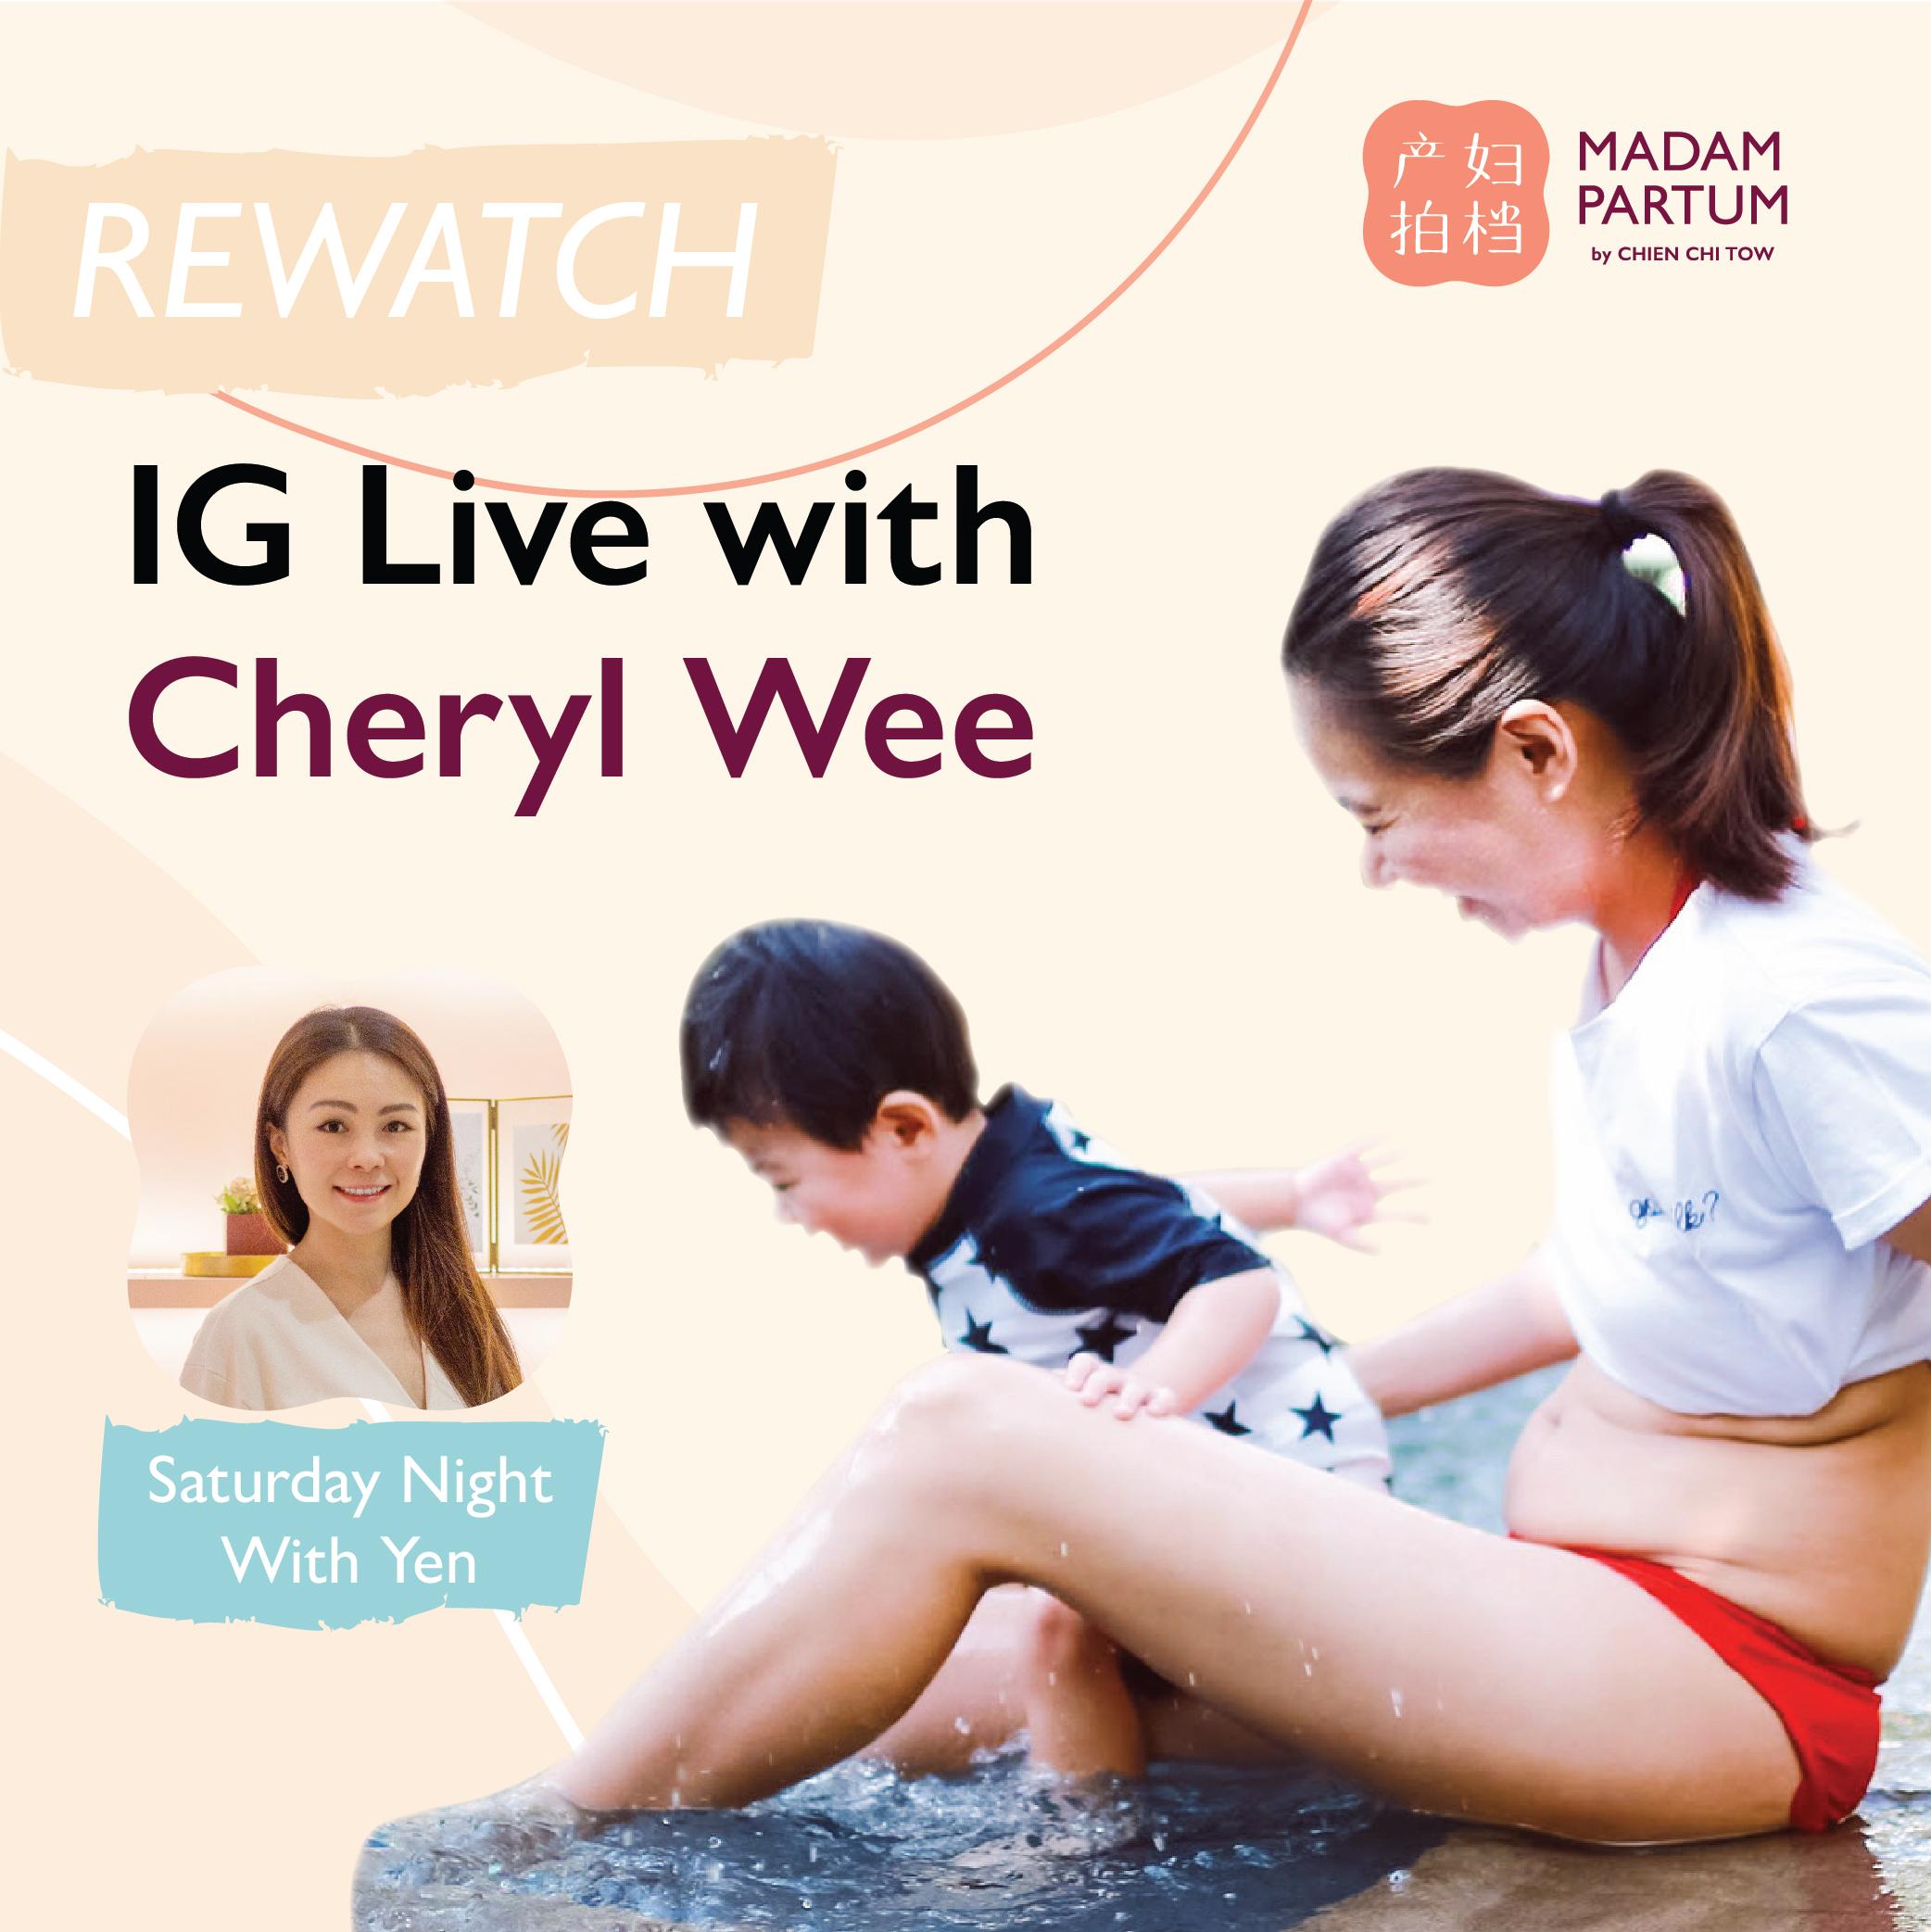 Cheryl's IG Live